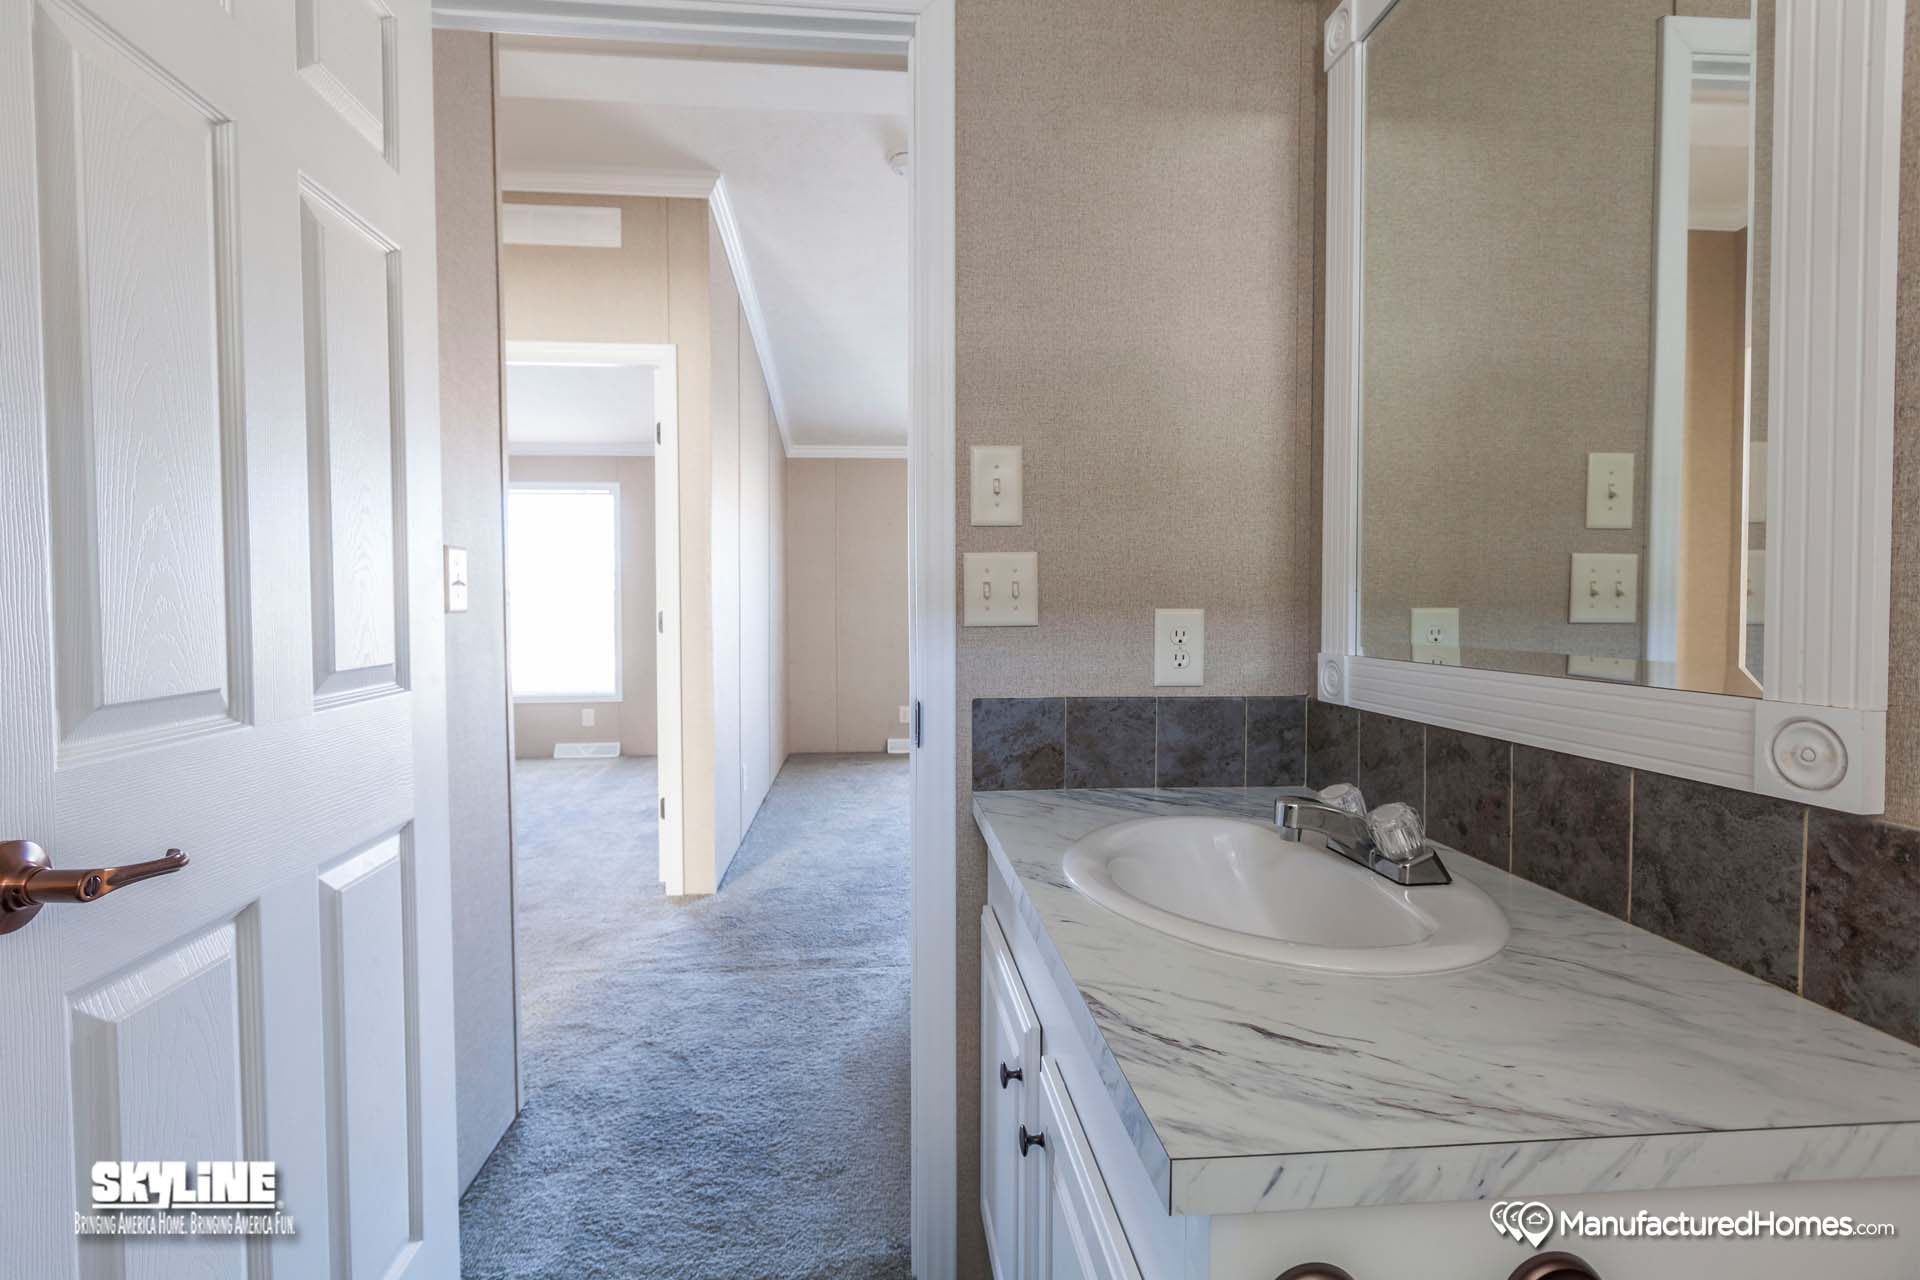 Kitchen Floor Plans Furthermore Sales On Bathroom Floor Plans 8 X 15